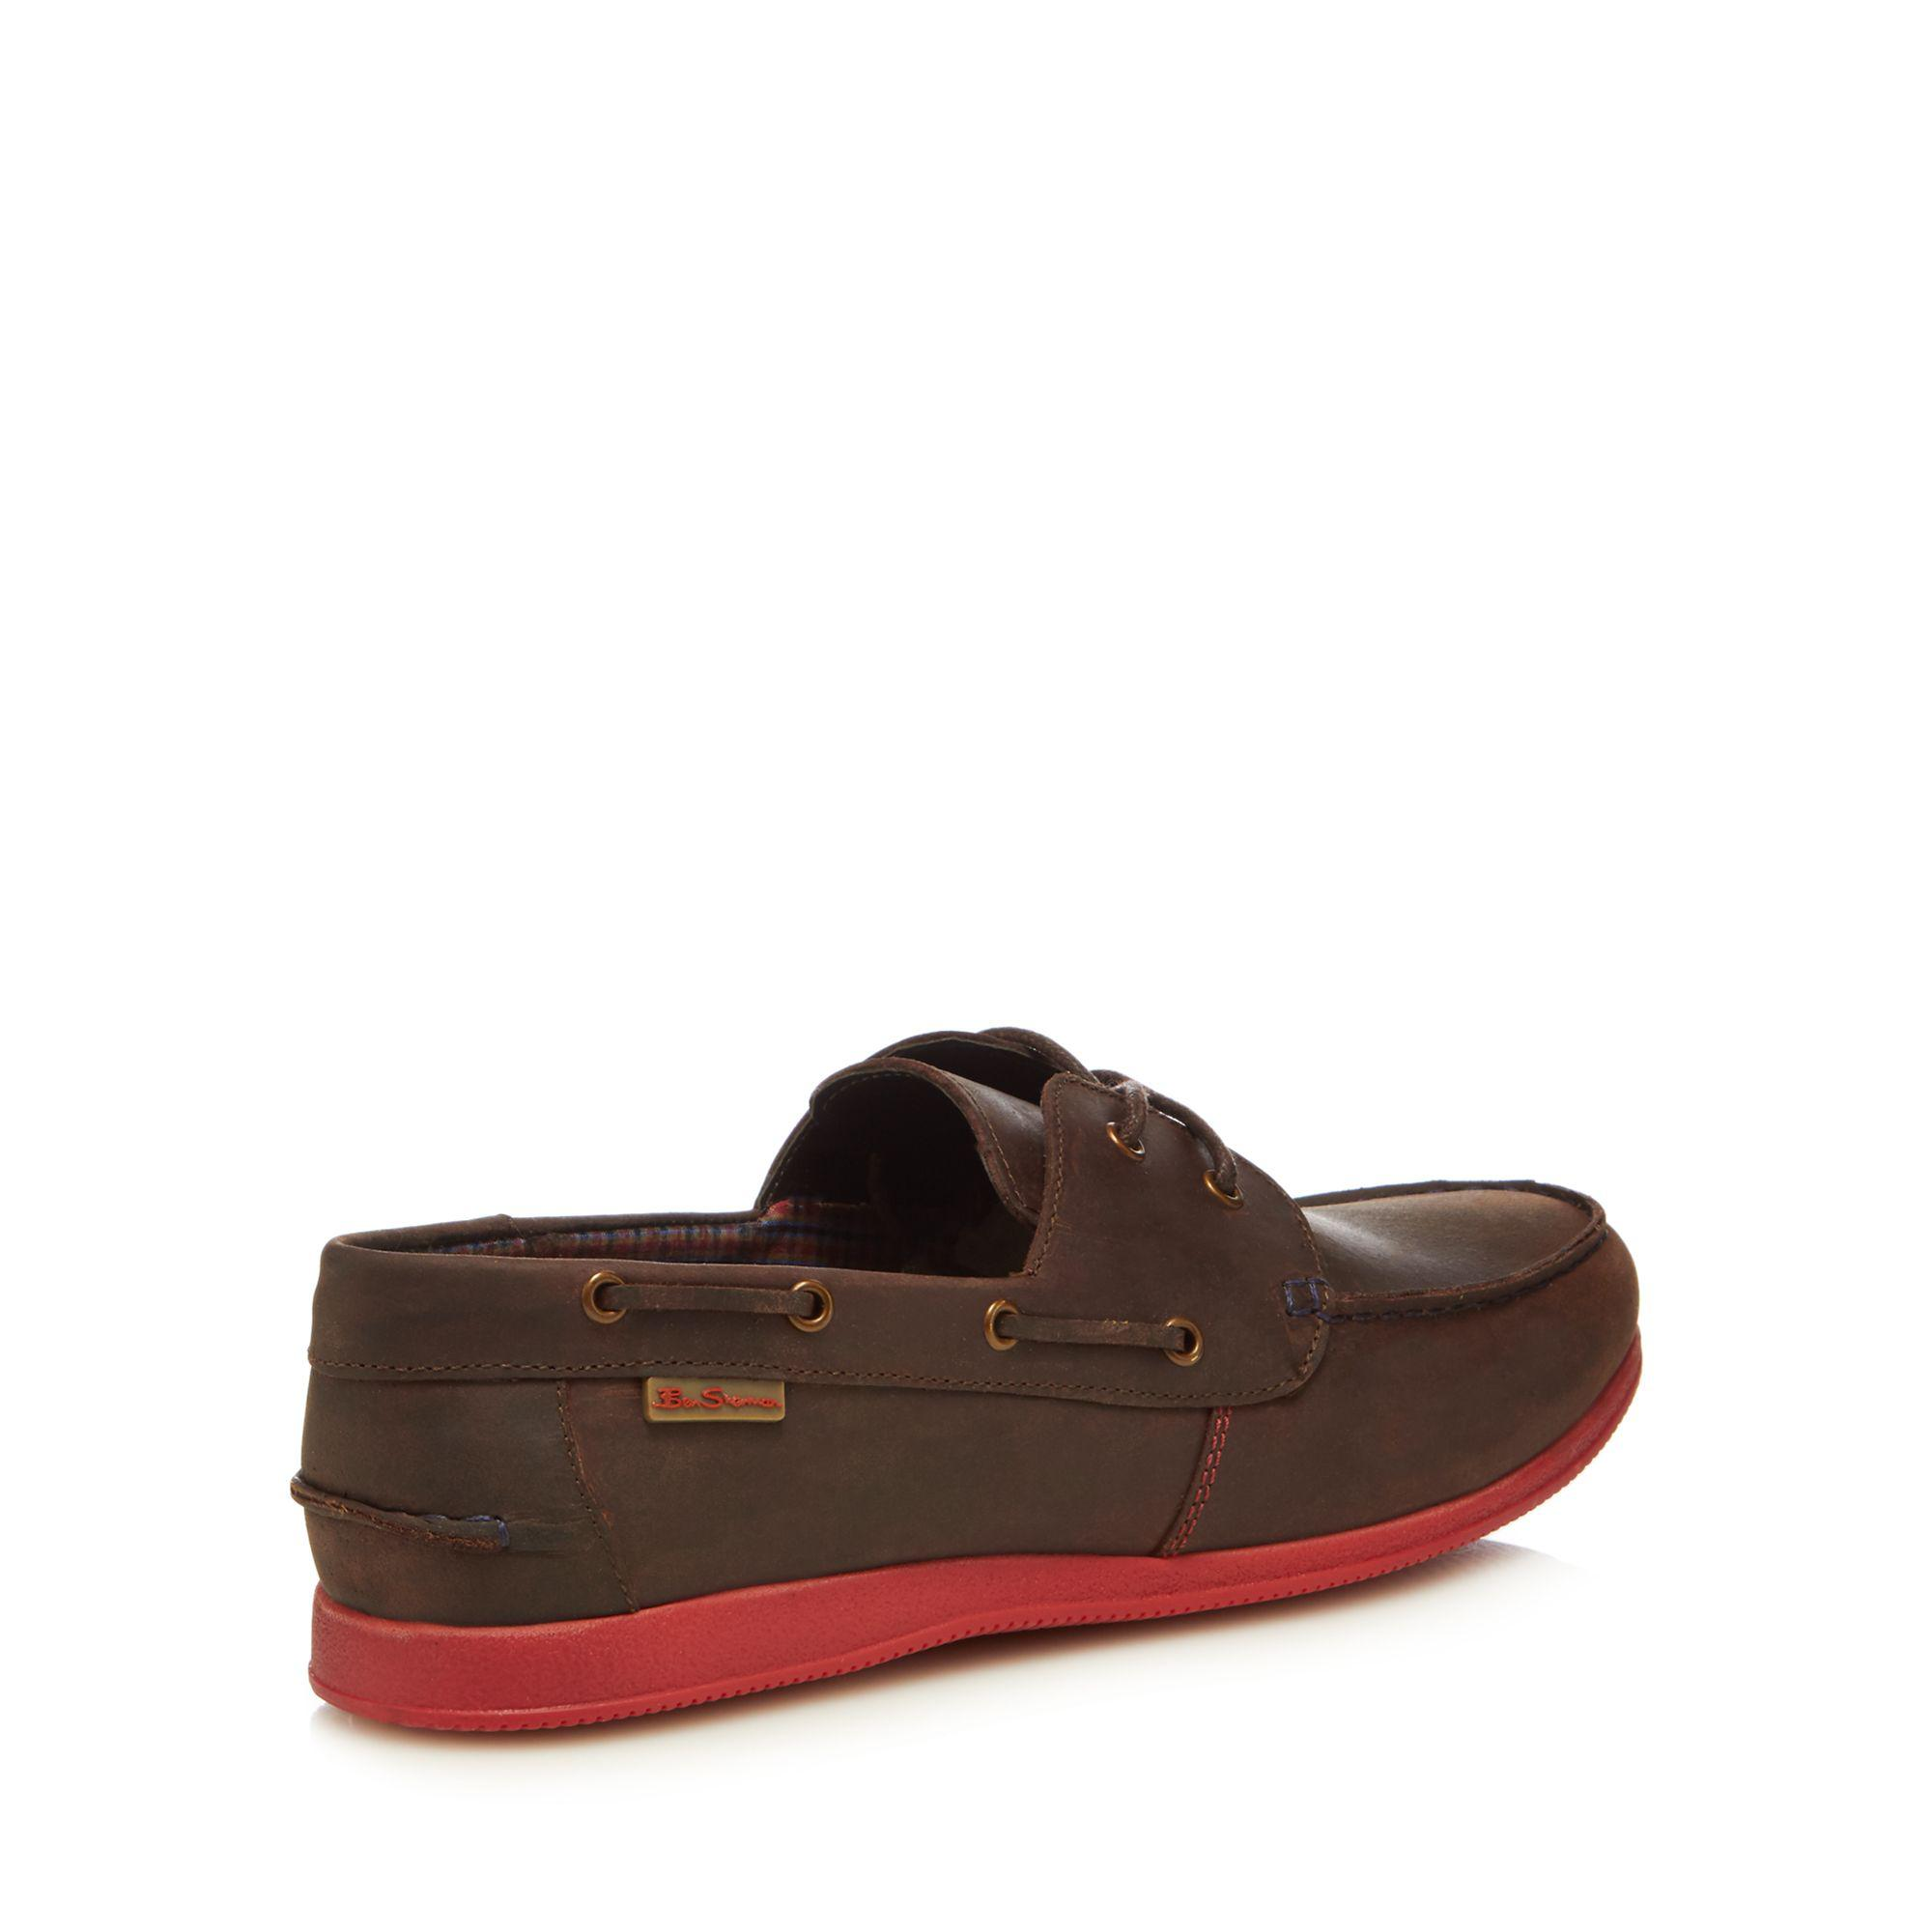 c45ed89431d9 Ben Sherman - Brown Nubuck  orlando  Boat Shoes for Men - Lyst. View  fullscreen